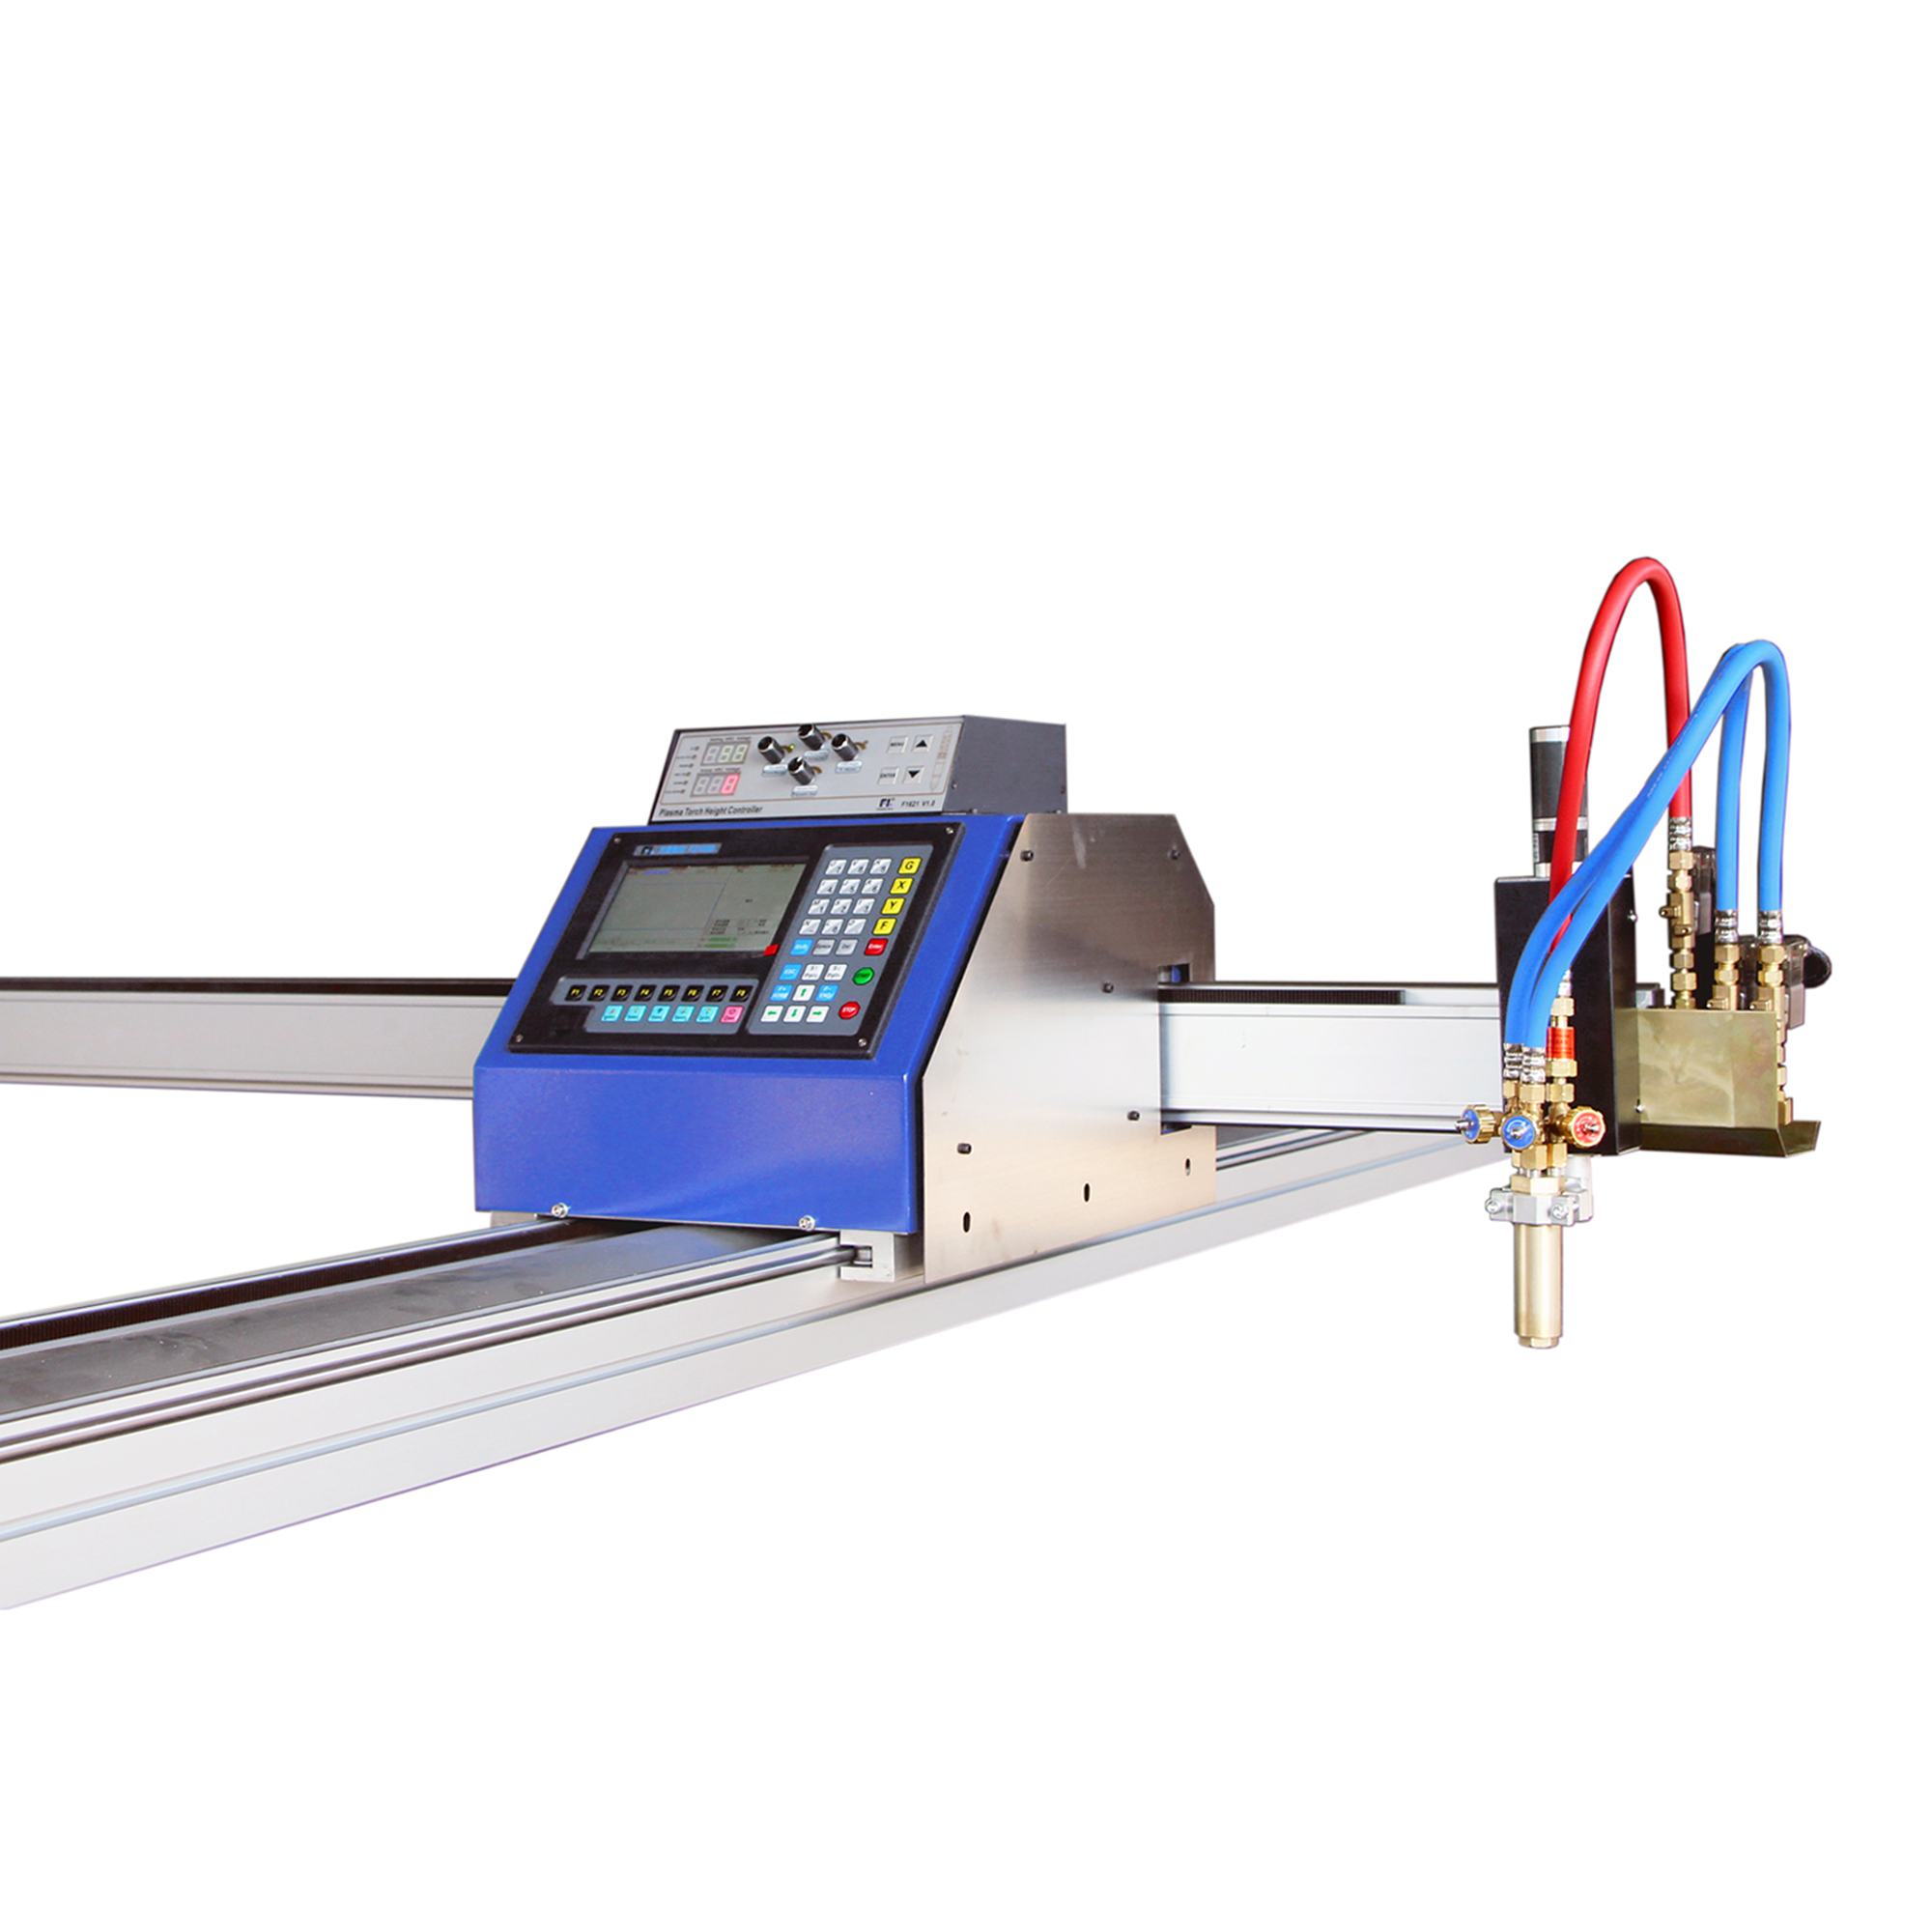 Steel Cutter Cnc Plasma Cutting Machine - Buy Cnc Plasma Cutter,Plasma  Cutting Machine,Steel Cutting Machine Product on Alibaba.com